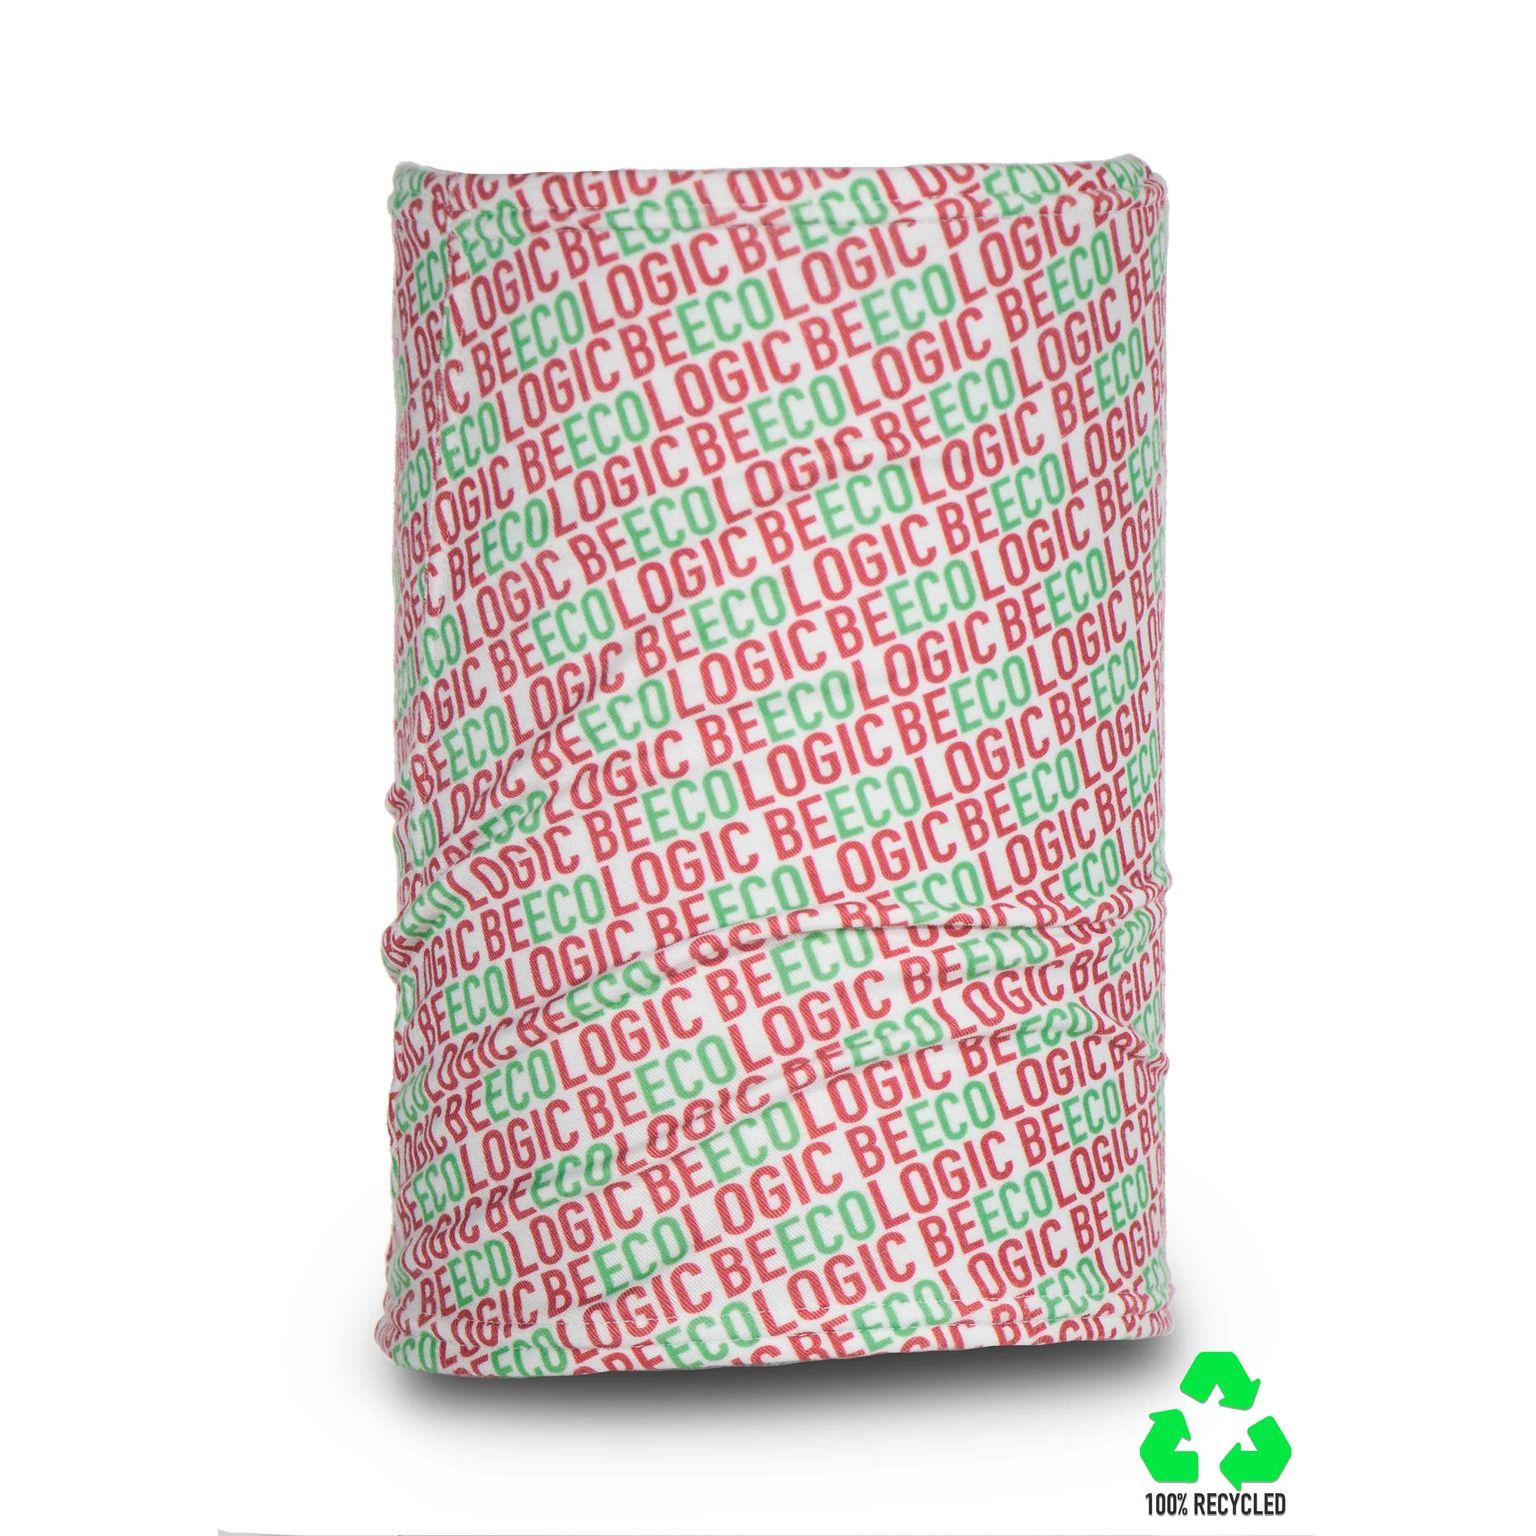 Tour de coup/Bandana tubulaire d'hiver en 100% tissue polaire recyclé RPET, Made in Italy